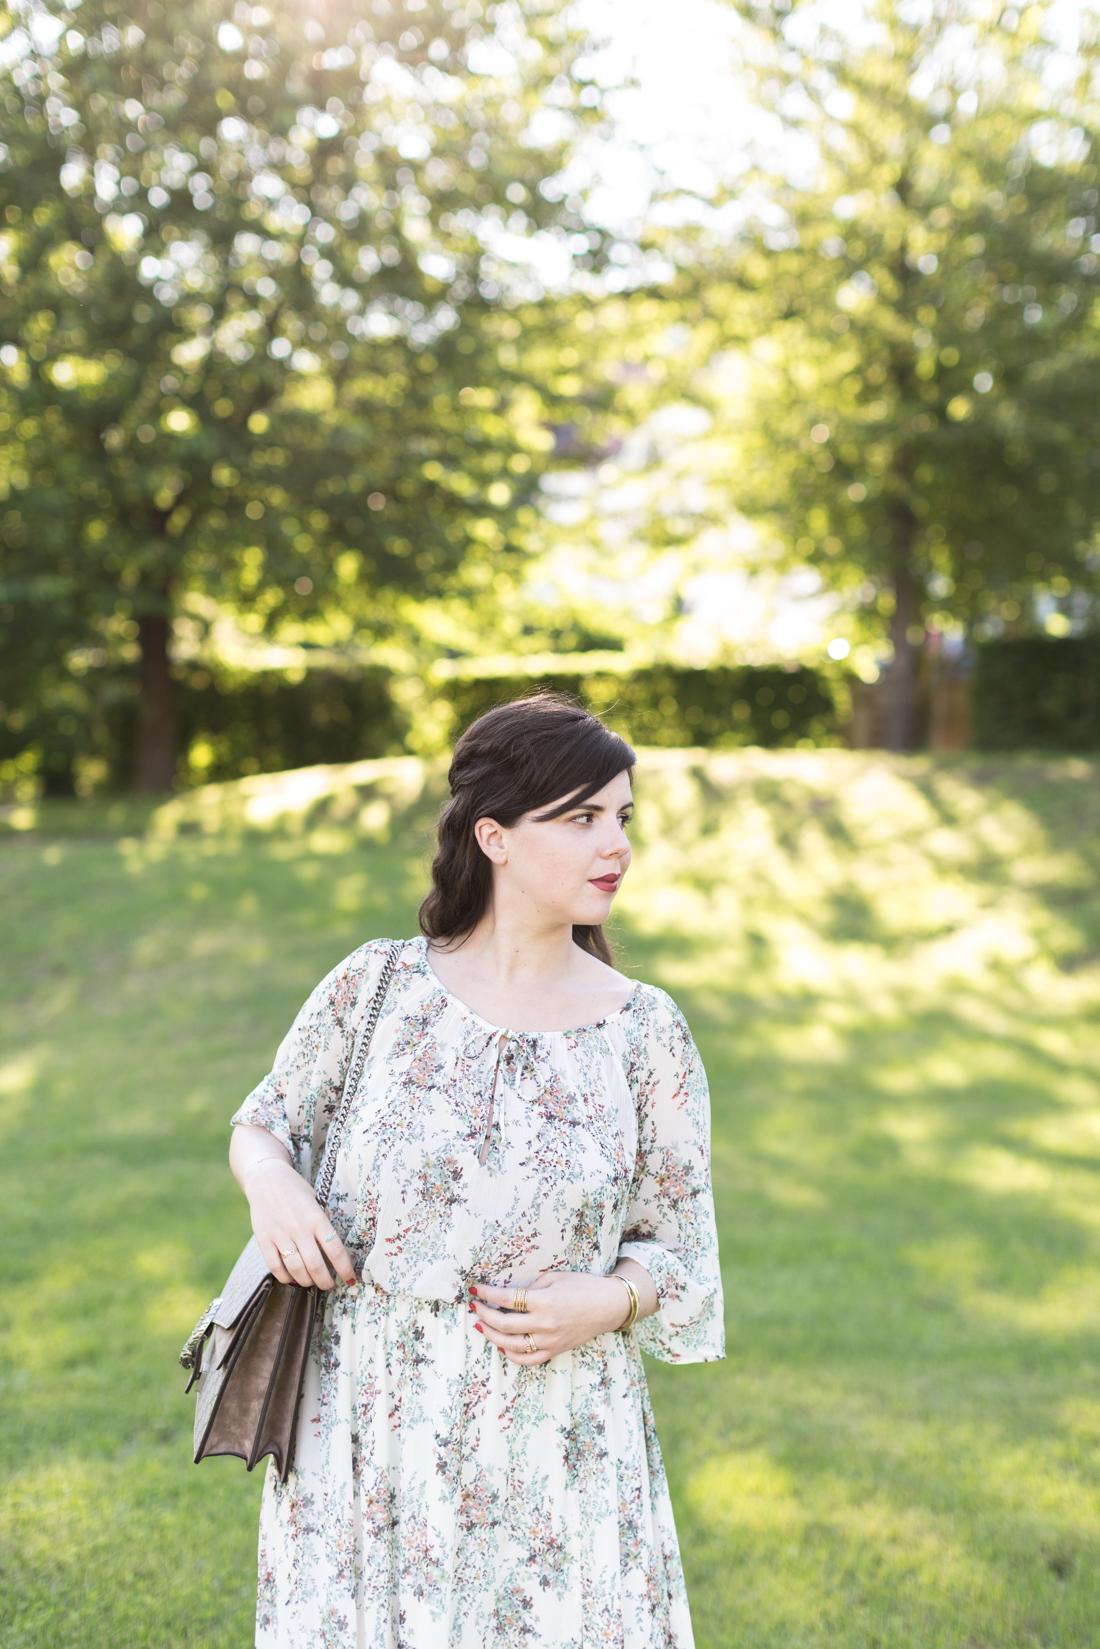 1100 robe ikks sac gucci dionysus espadrilles sezane - copyright Pauline paulinefashionblog.com-5